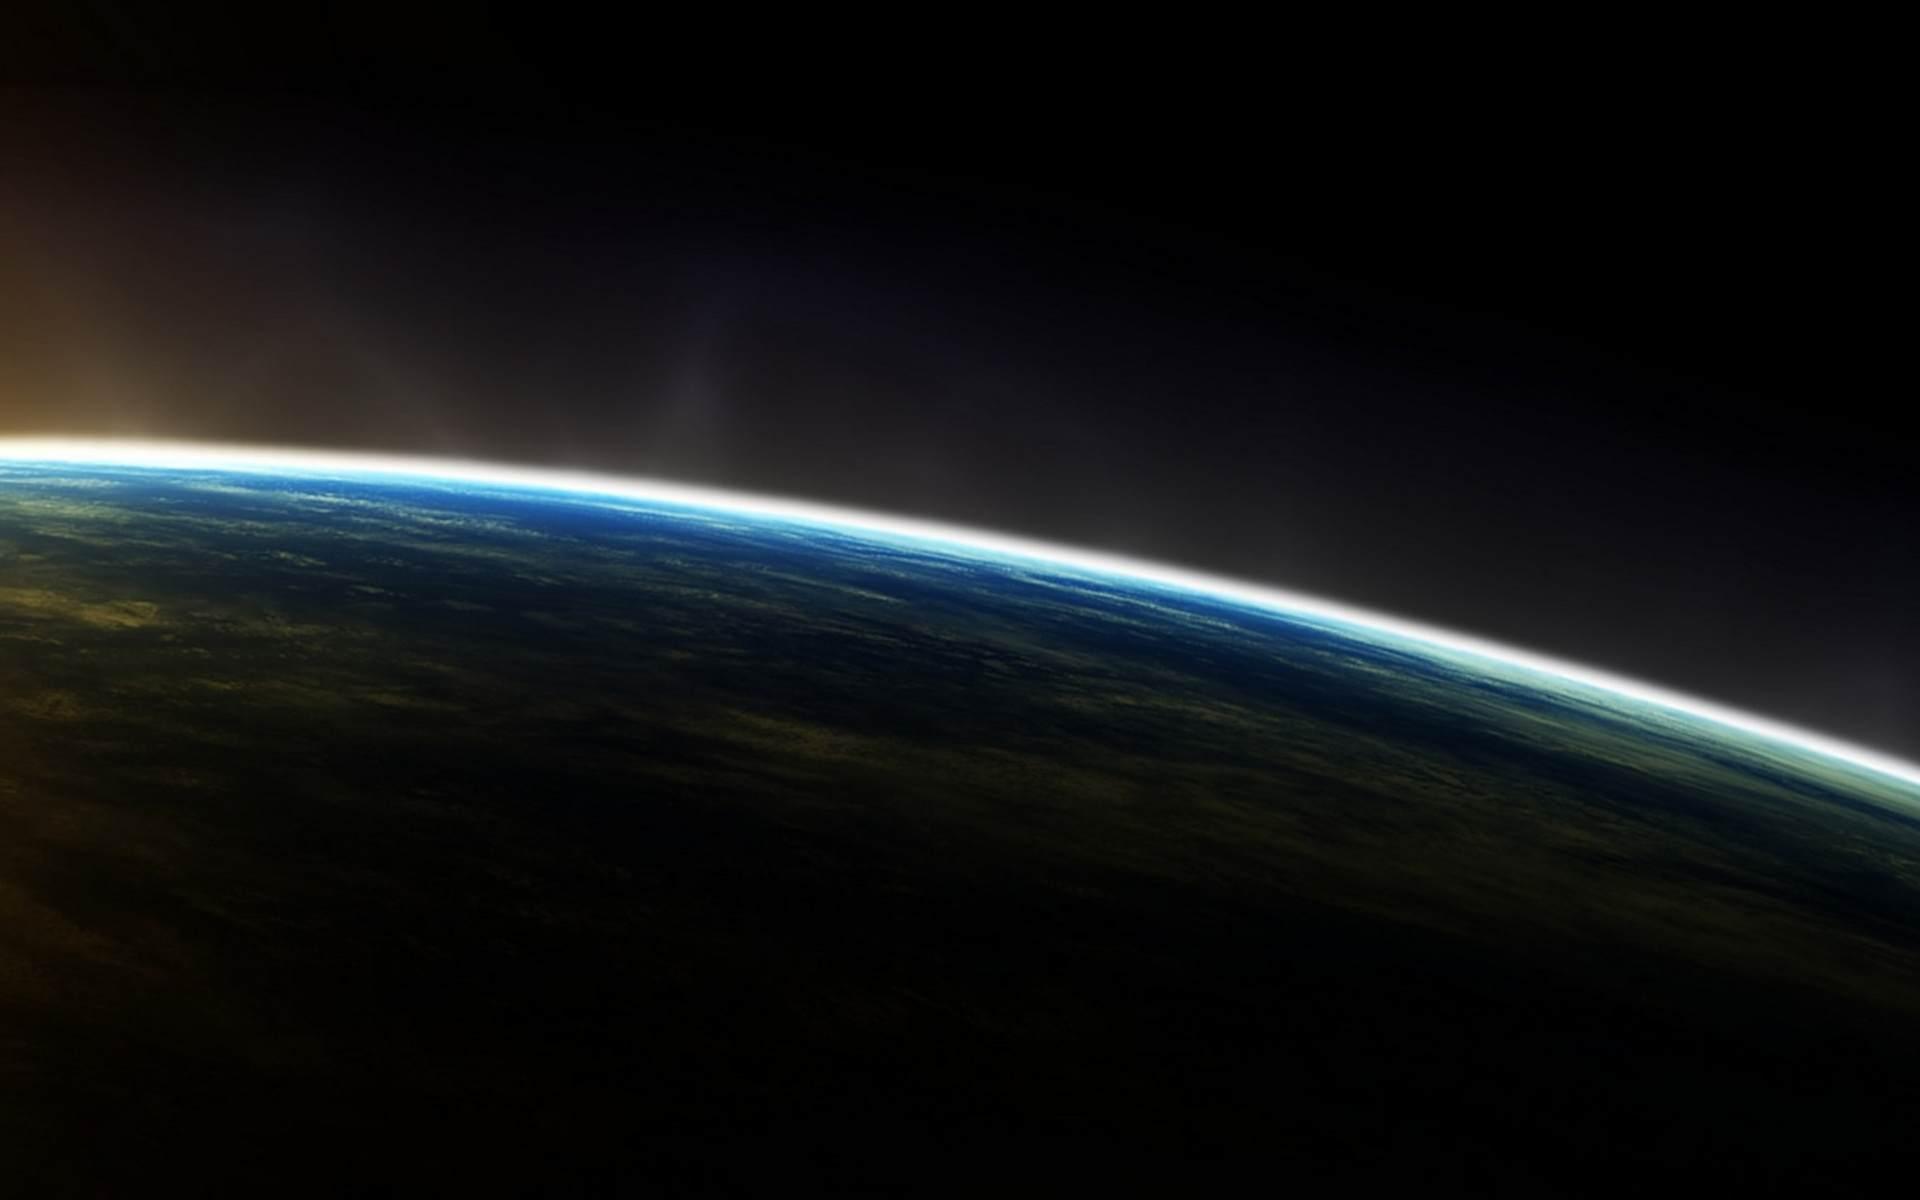 Black Earth Wallpaper 1 Desktop Background Earth From Space Morning 1920x1200 Download Hd Wallpaper Wallpapertip